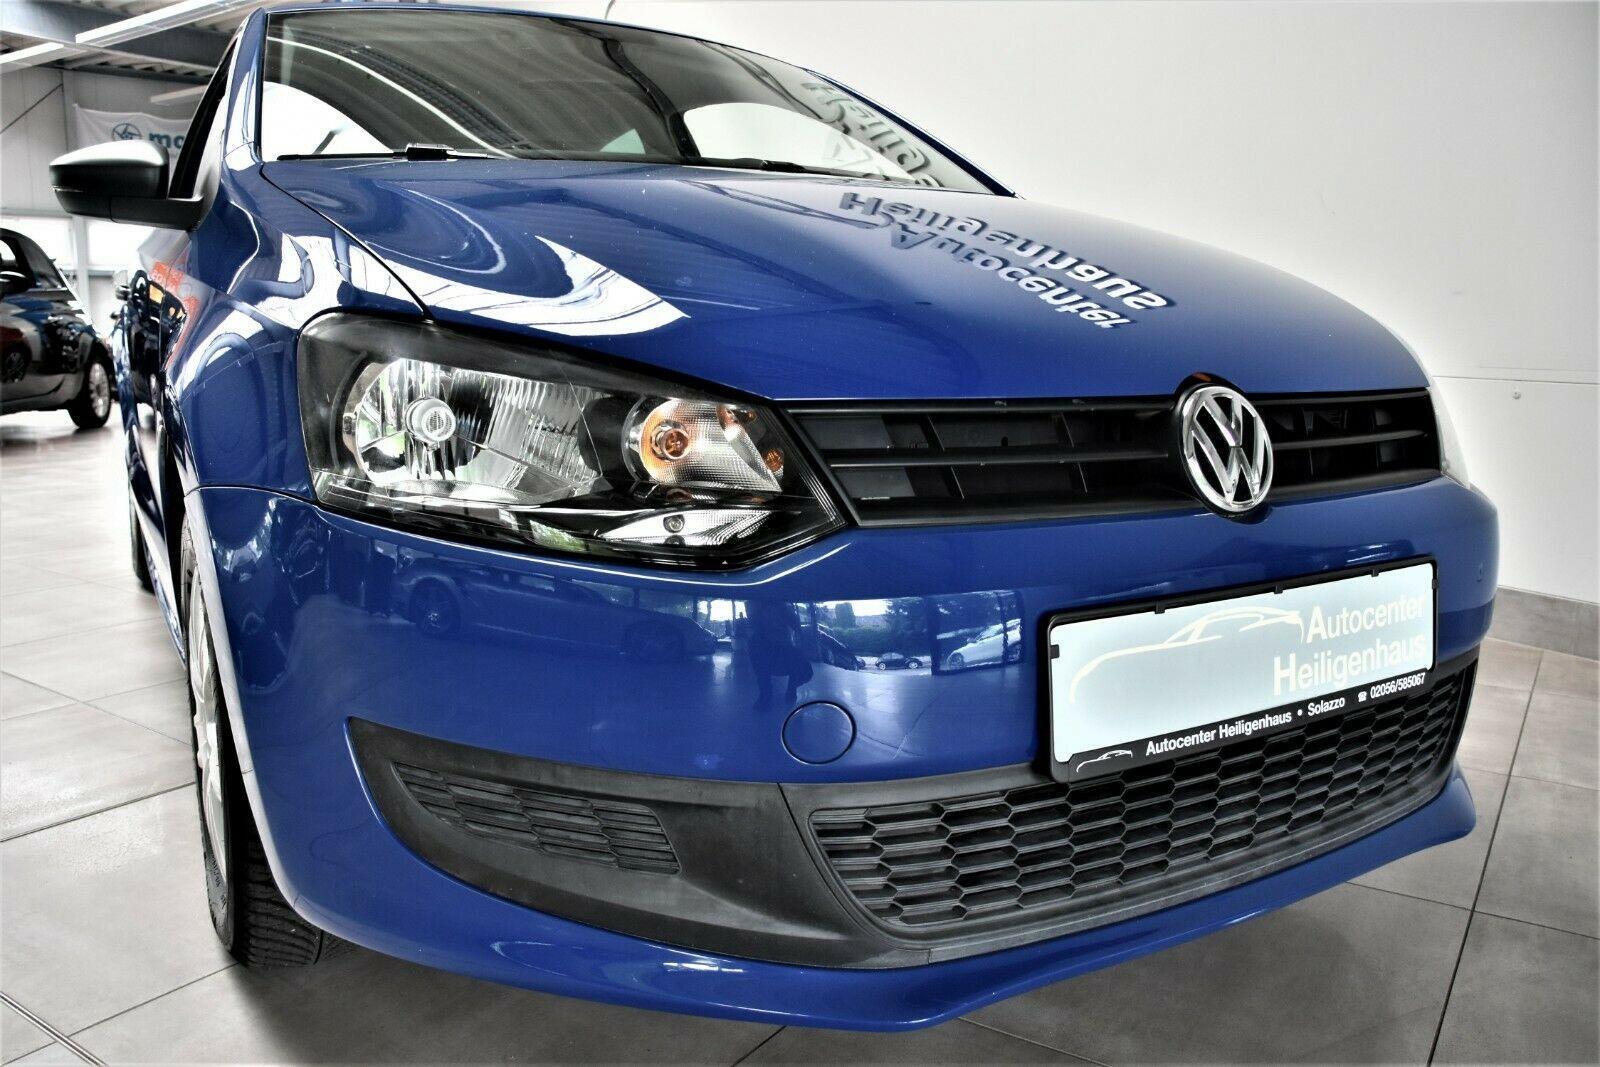 VW Polo V 1.2 Klima Navi Kamera Allwetter Tempomat